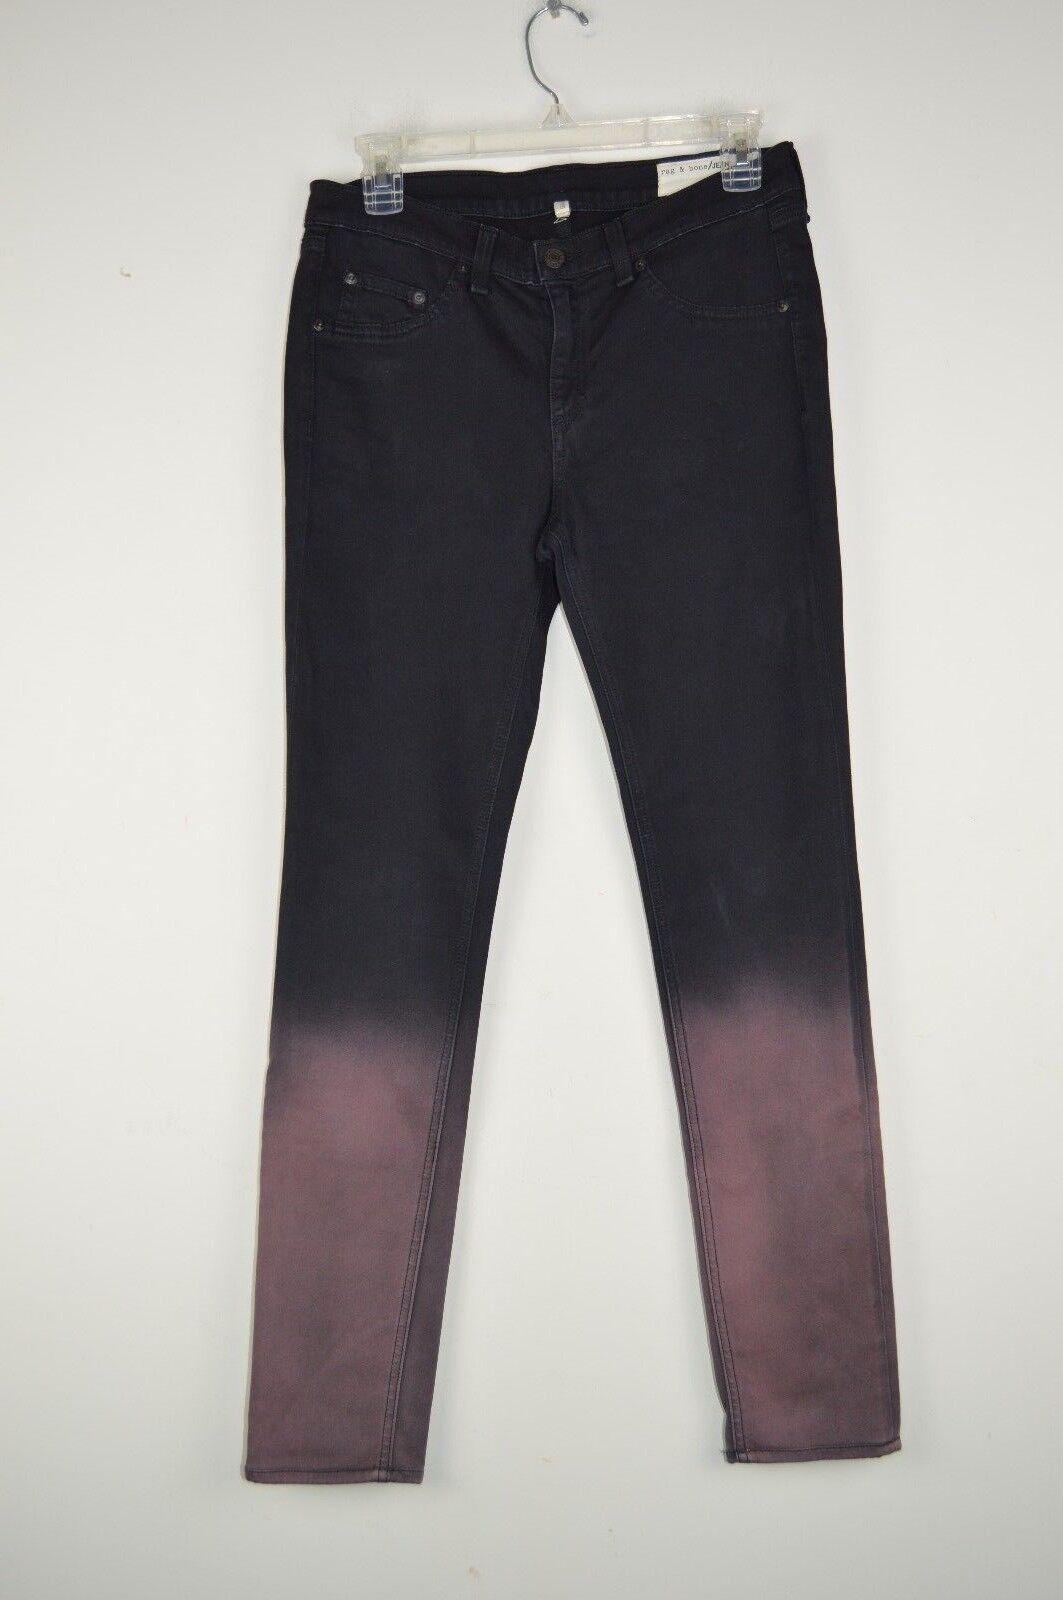 Rag & Bone Womens 28 Rusted Ombre Leggings Jeans Skinny Dipped Dye Leg W1503O163